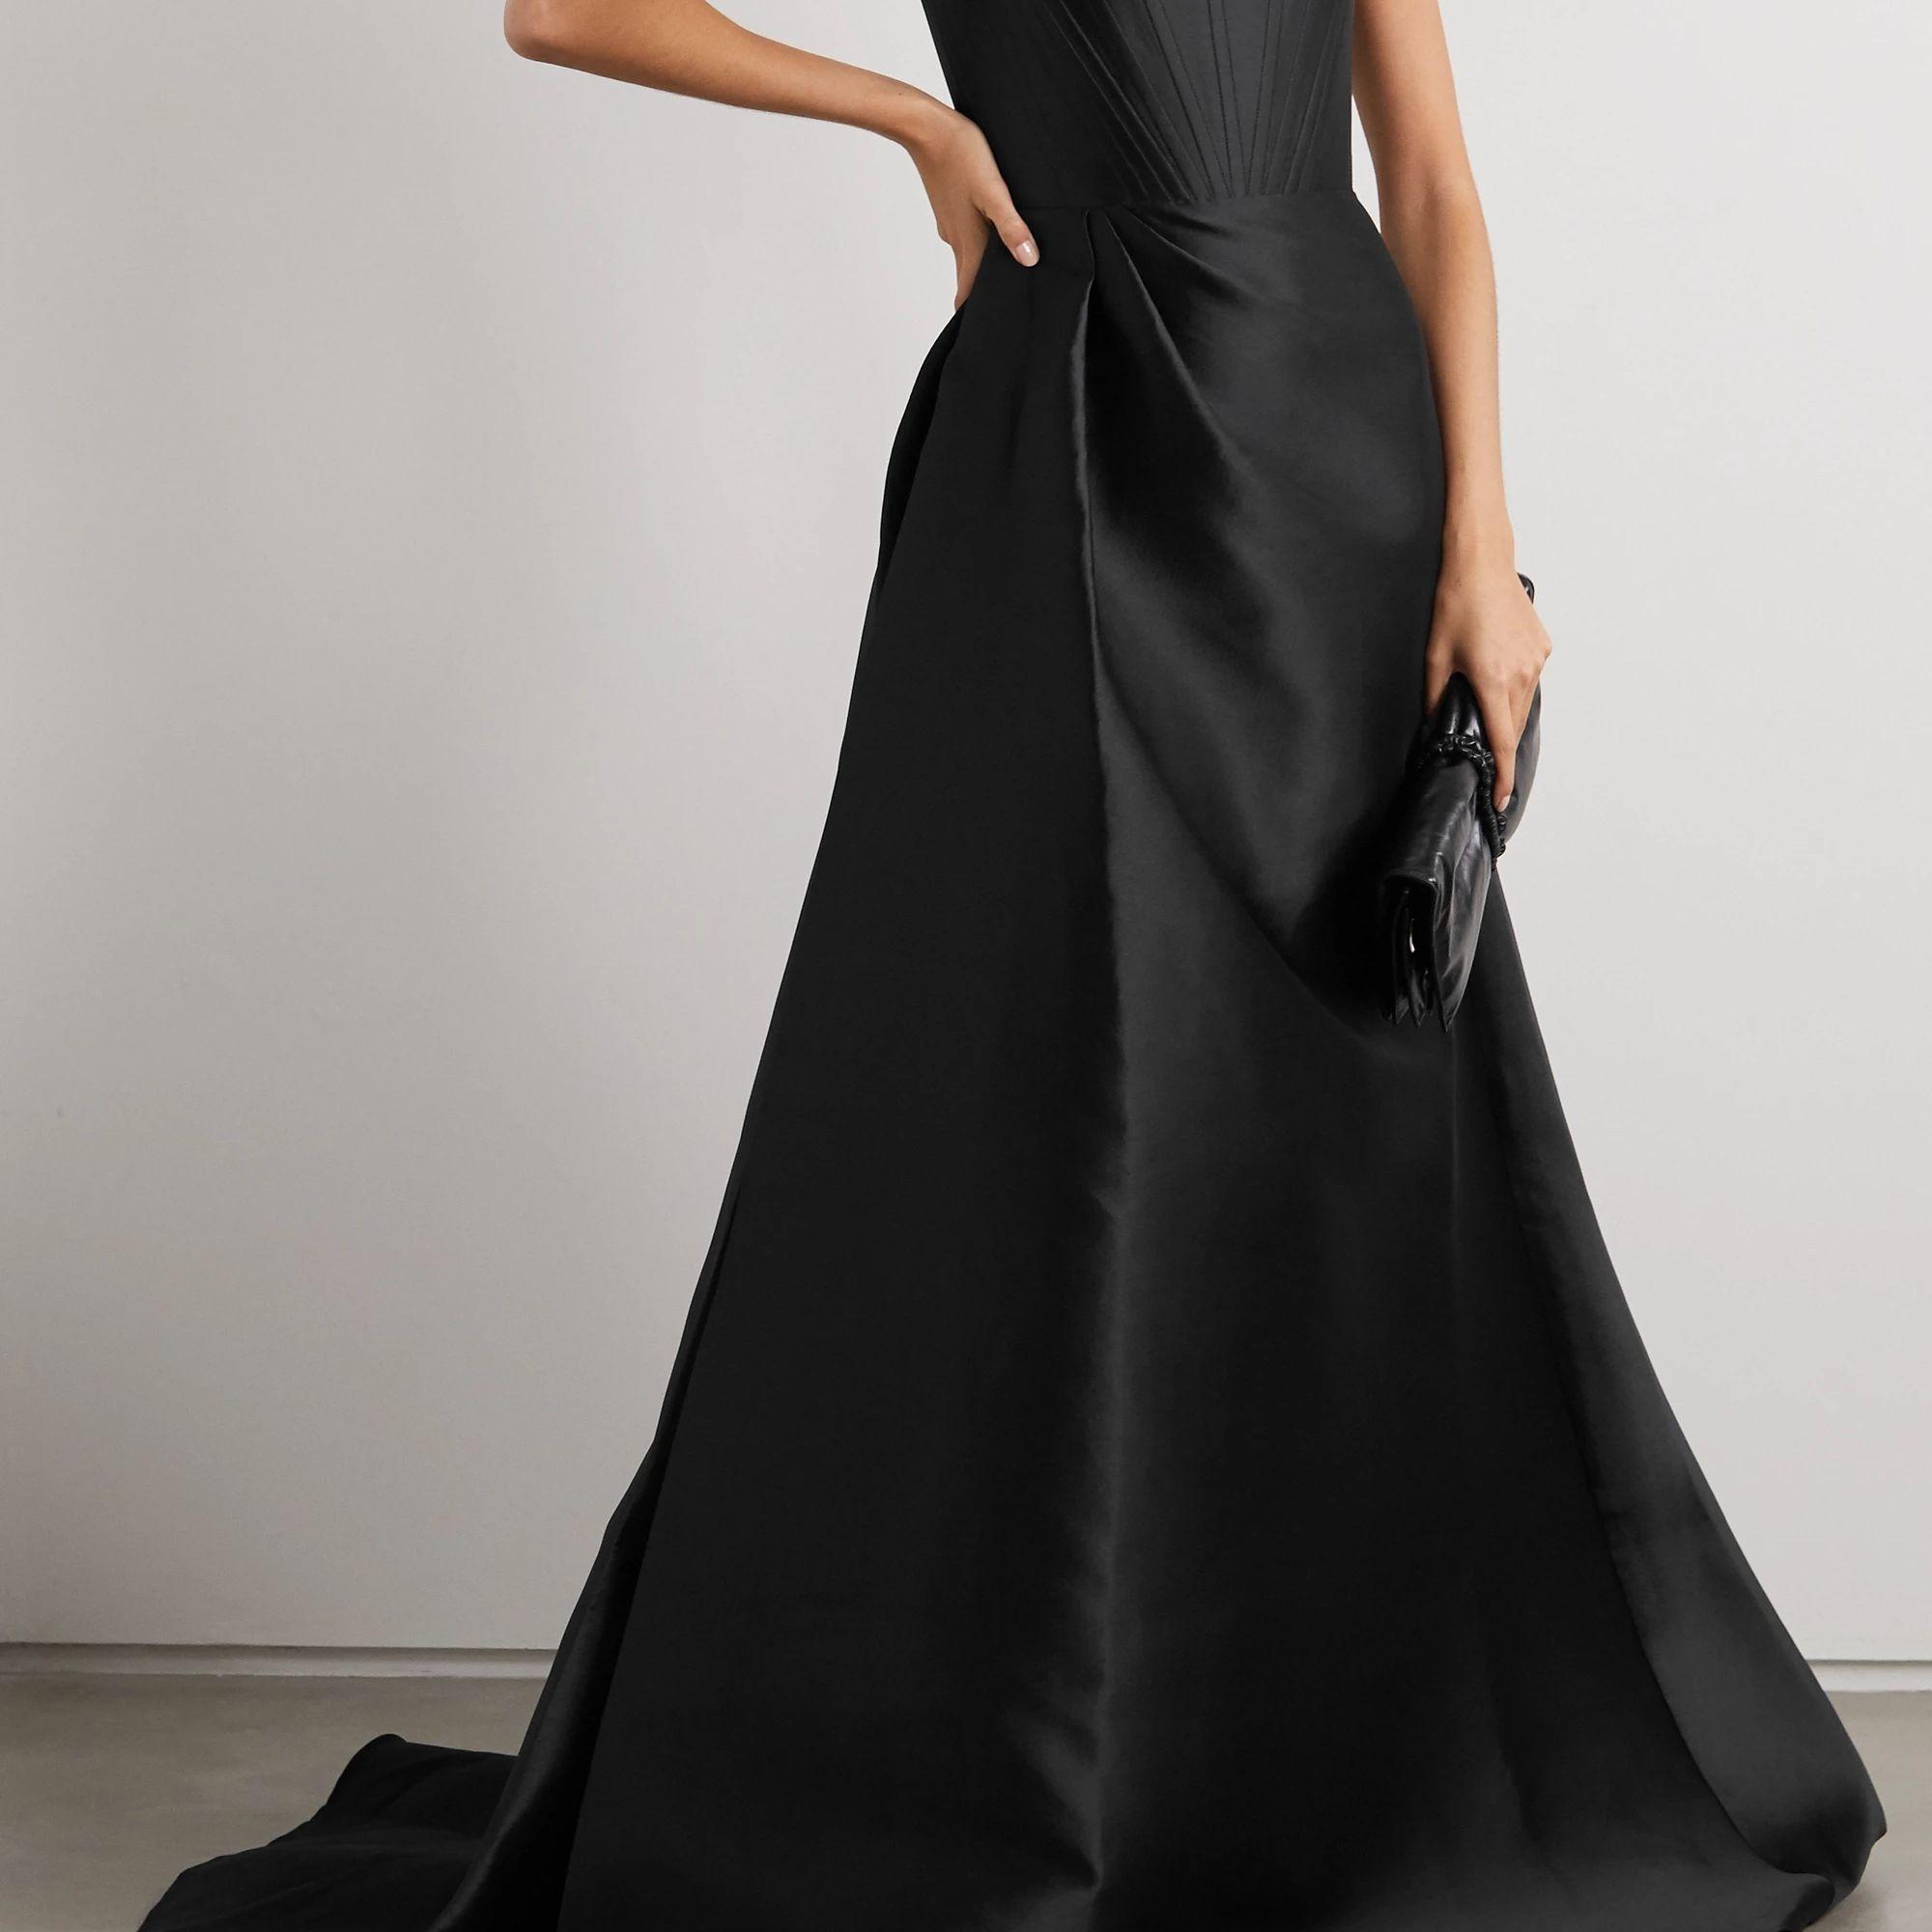 20 Best Black Wedding Dresses of 20